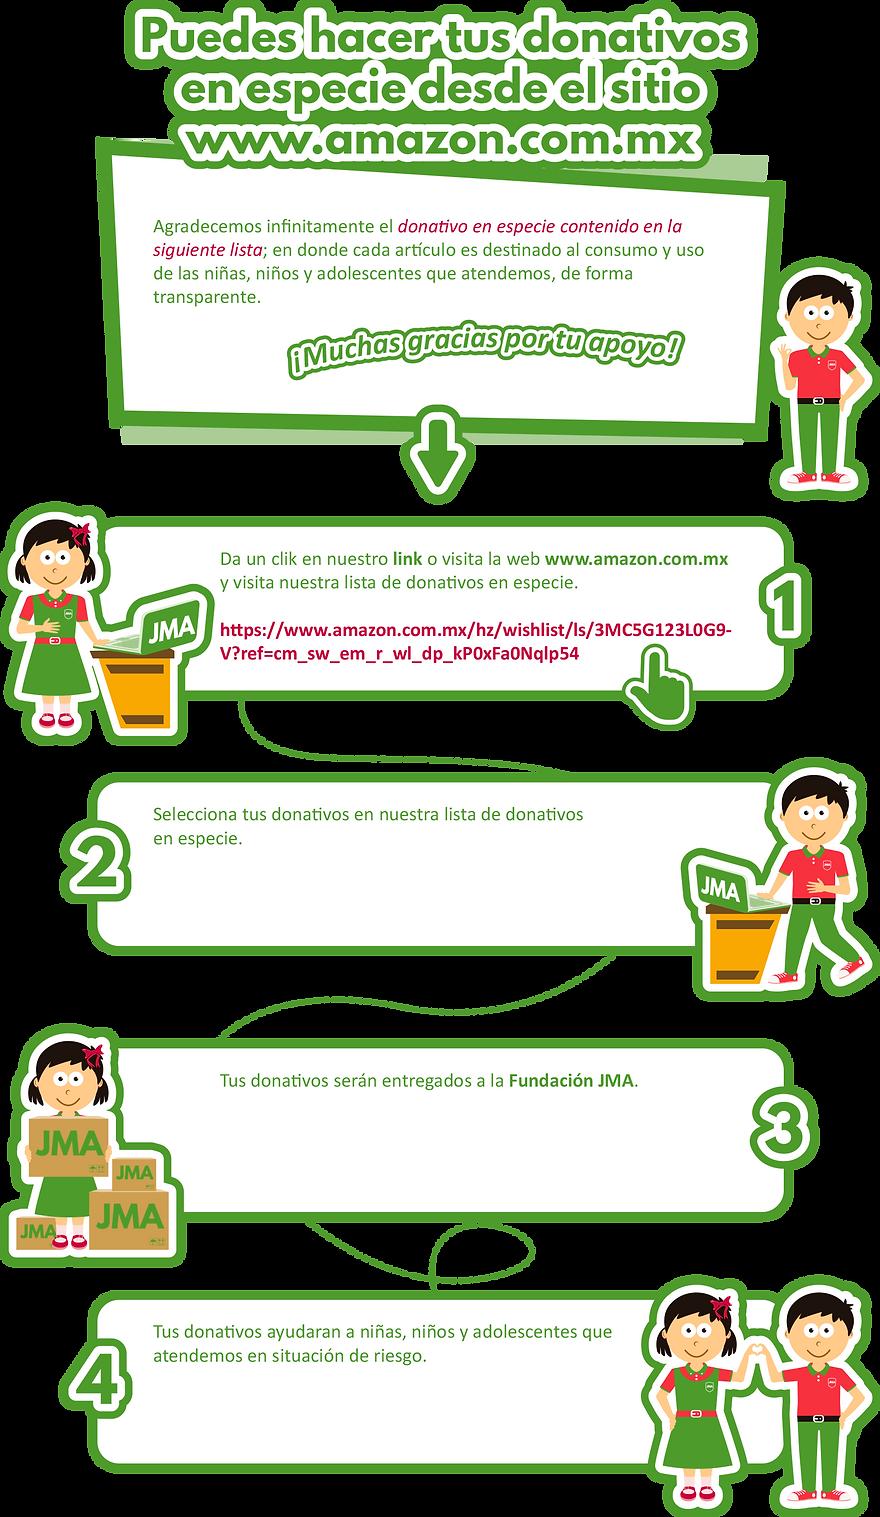 FJMA_Web_Contenidos_CA_Donativos_04.png